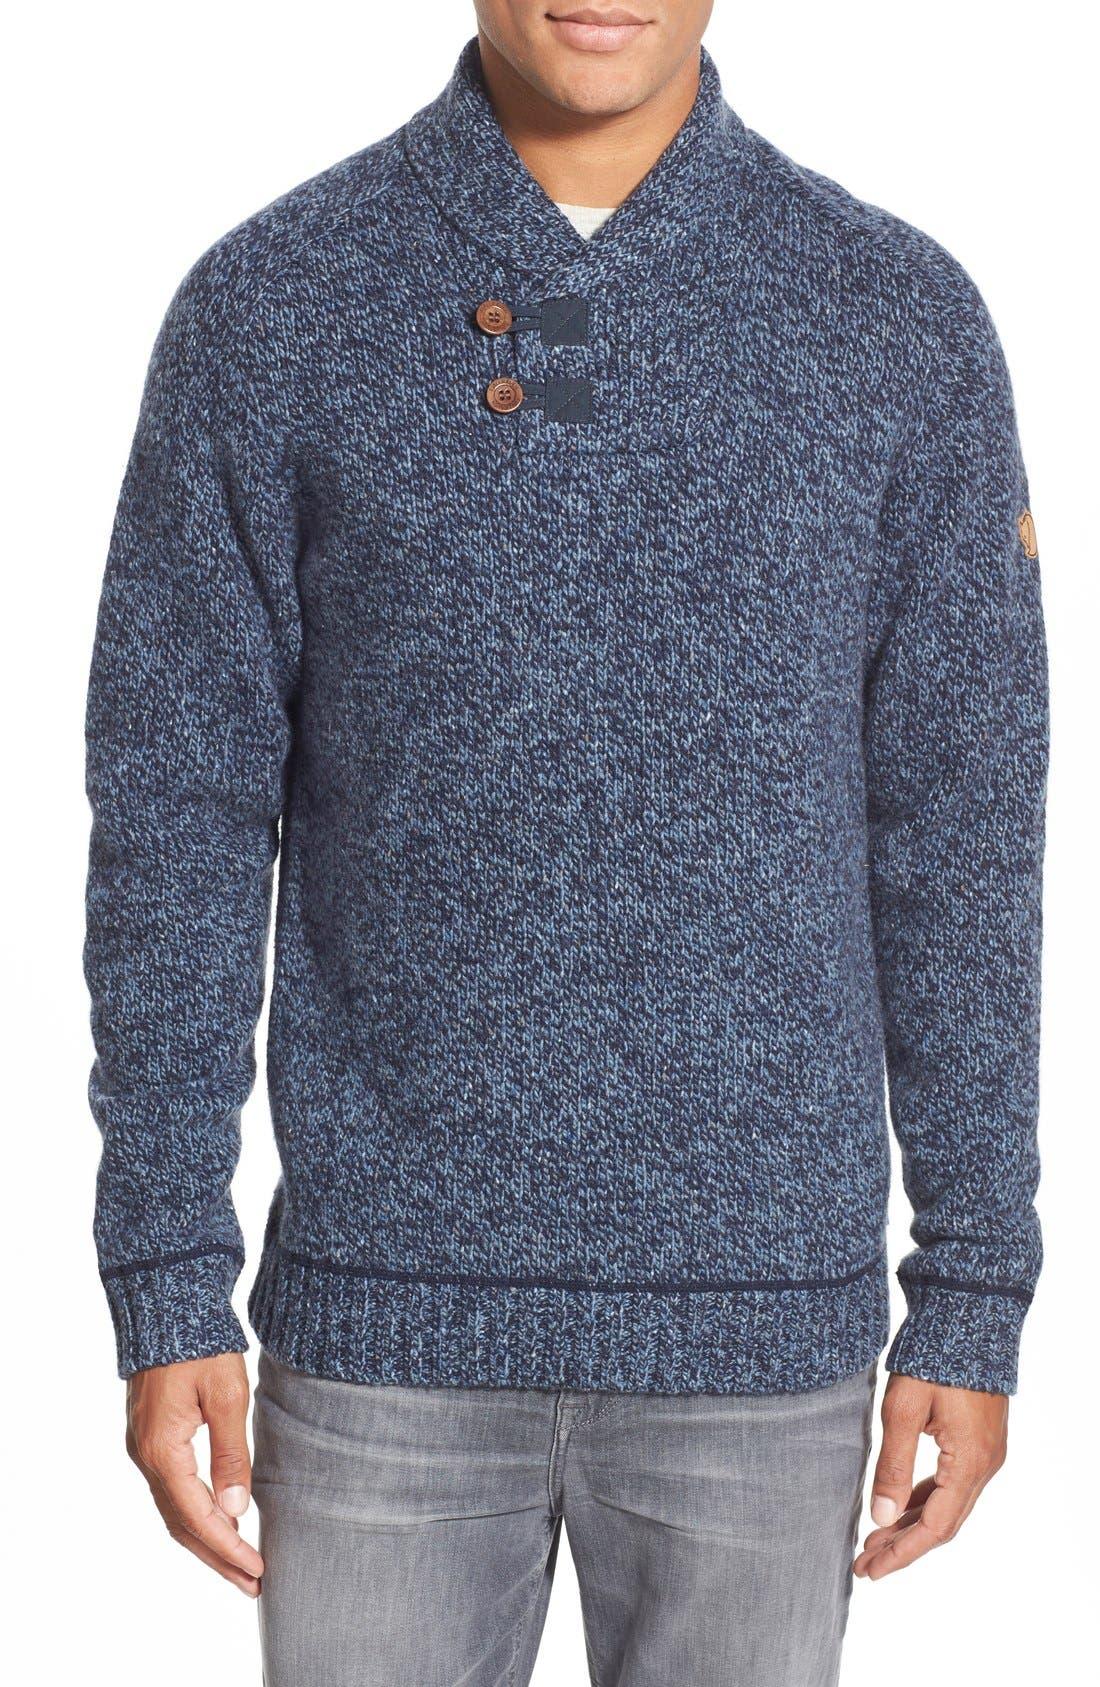 'Lada' Regular Fit Shawl Collar Sweater